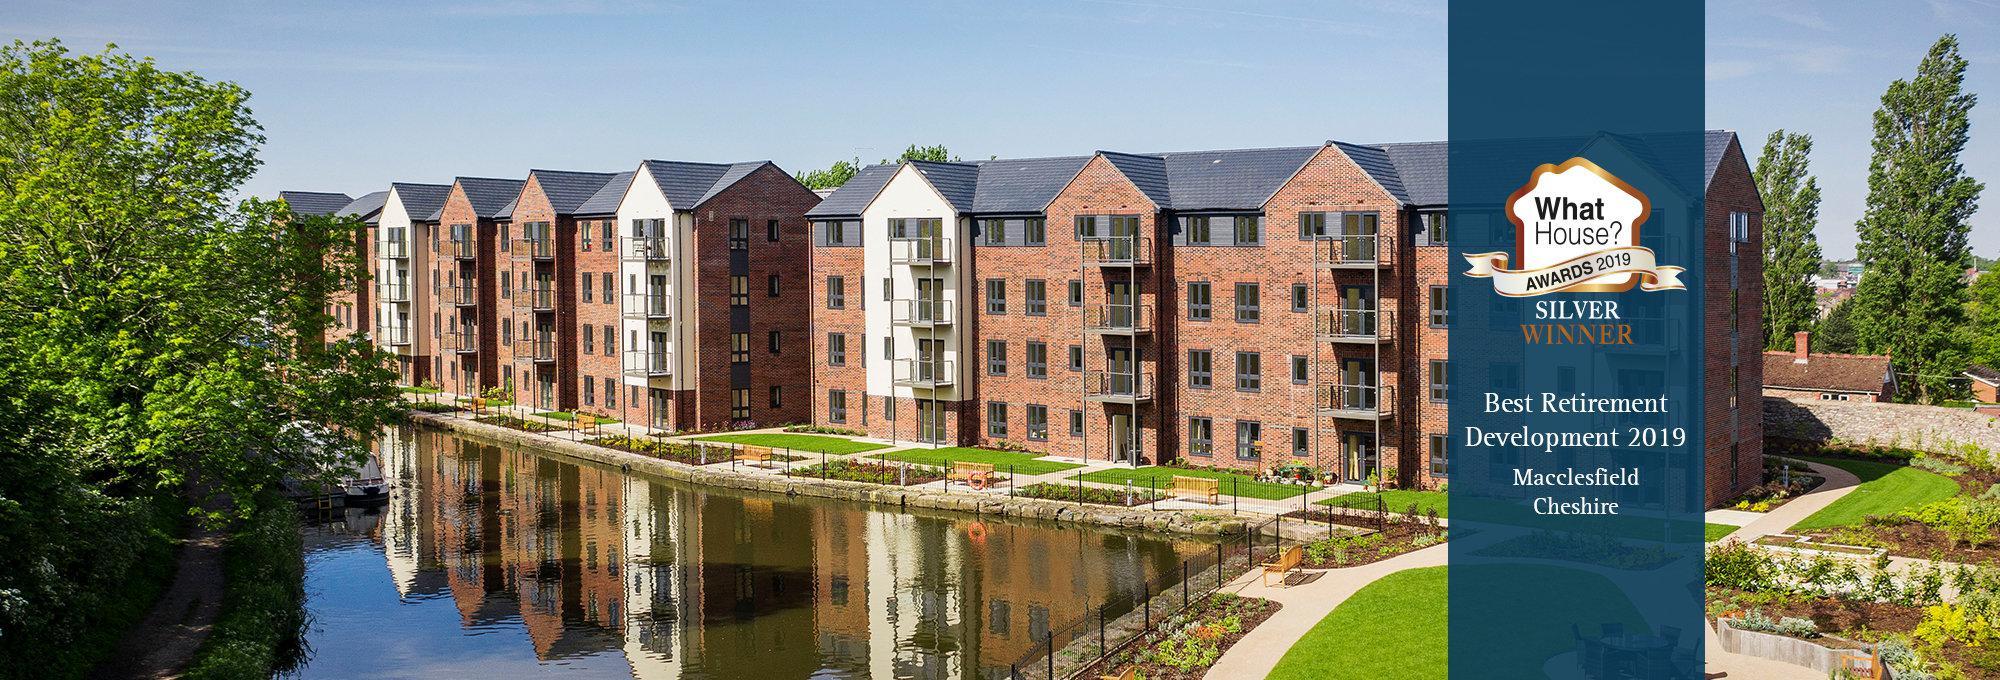 Adlington Residential Retirement complex